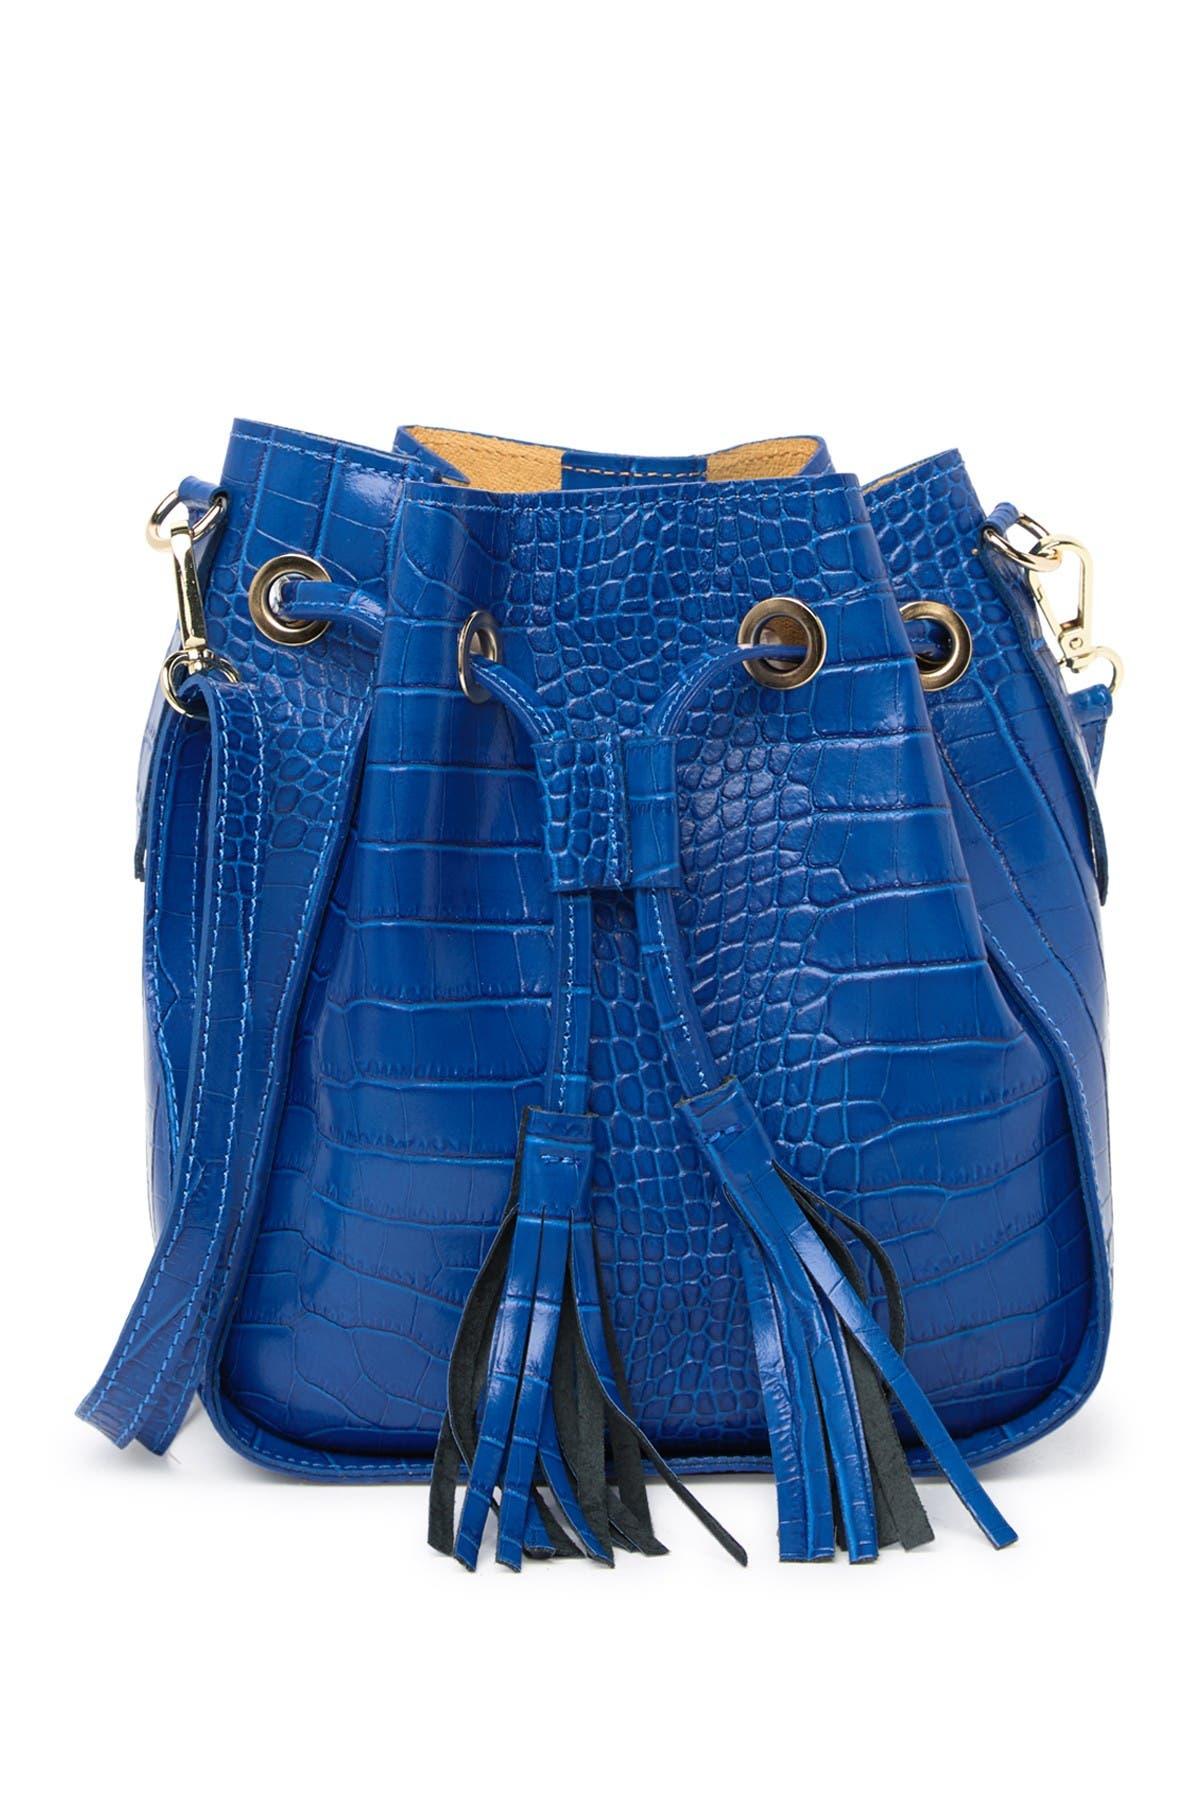 Image of Persaman New York Berenice Embossed Bucket Bag